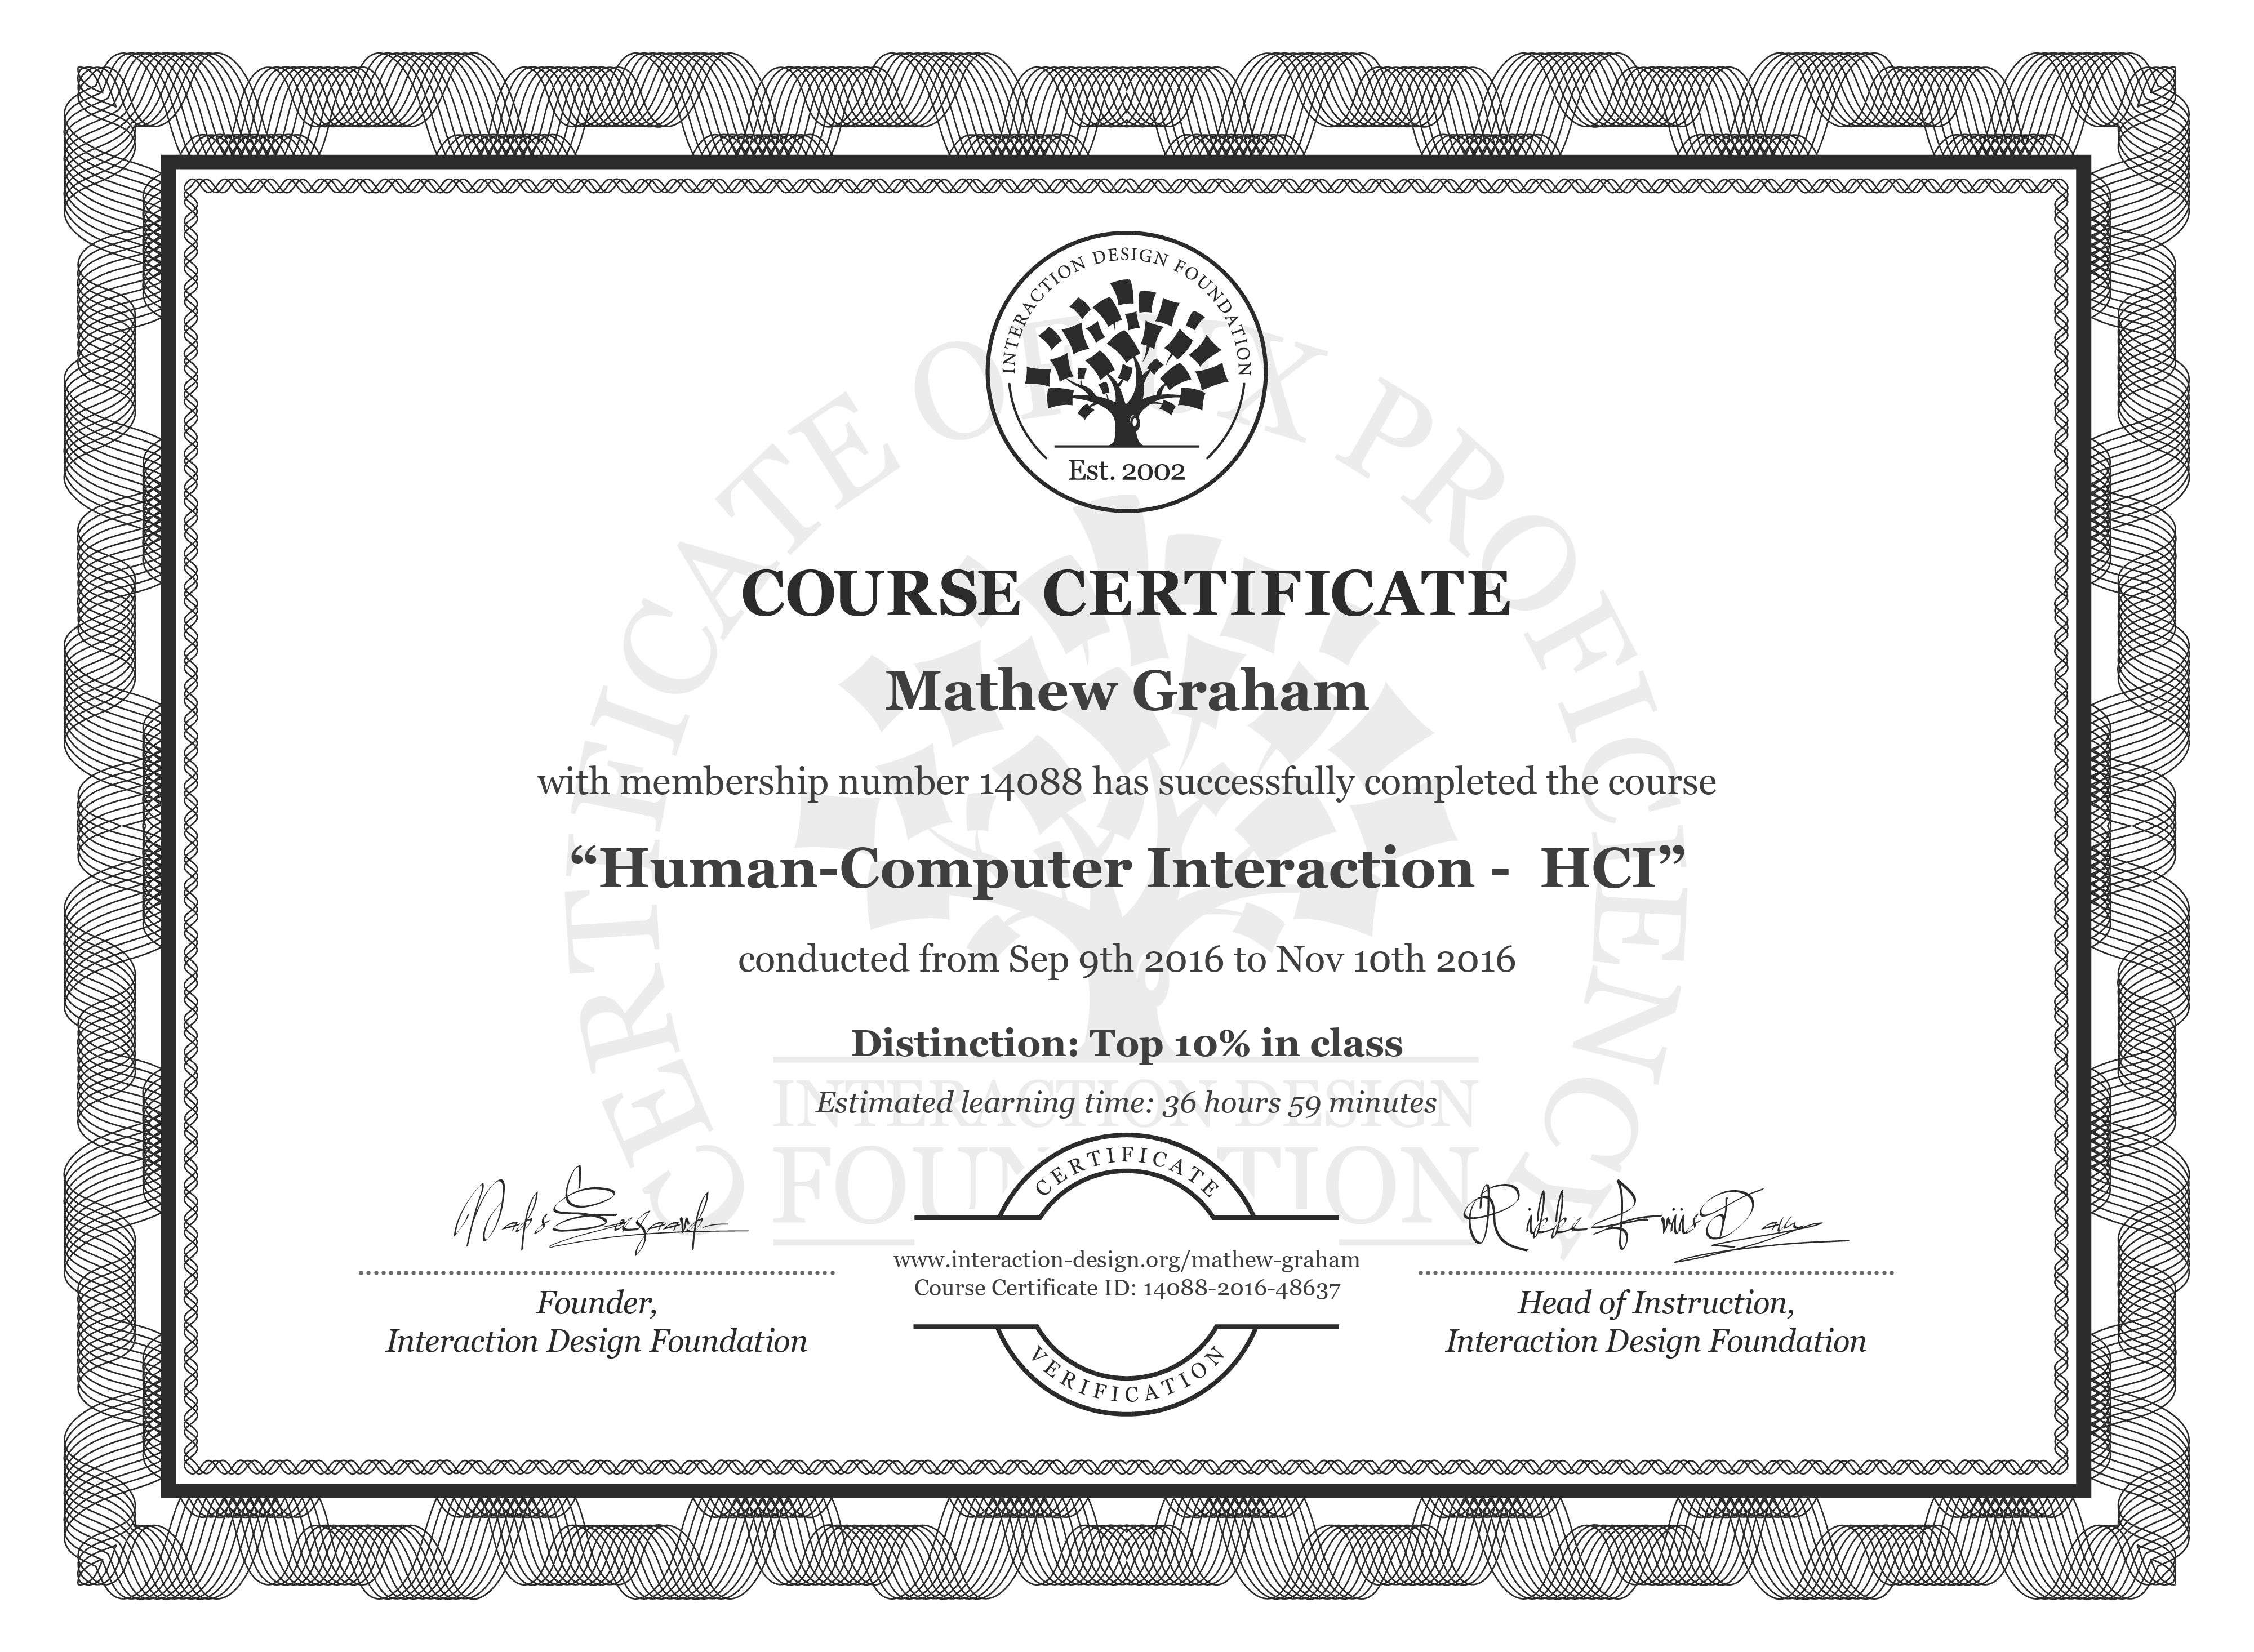 Mathew Graham's Course Certificate: Human-Computer Interaction -  HCI